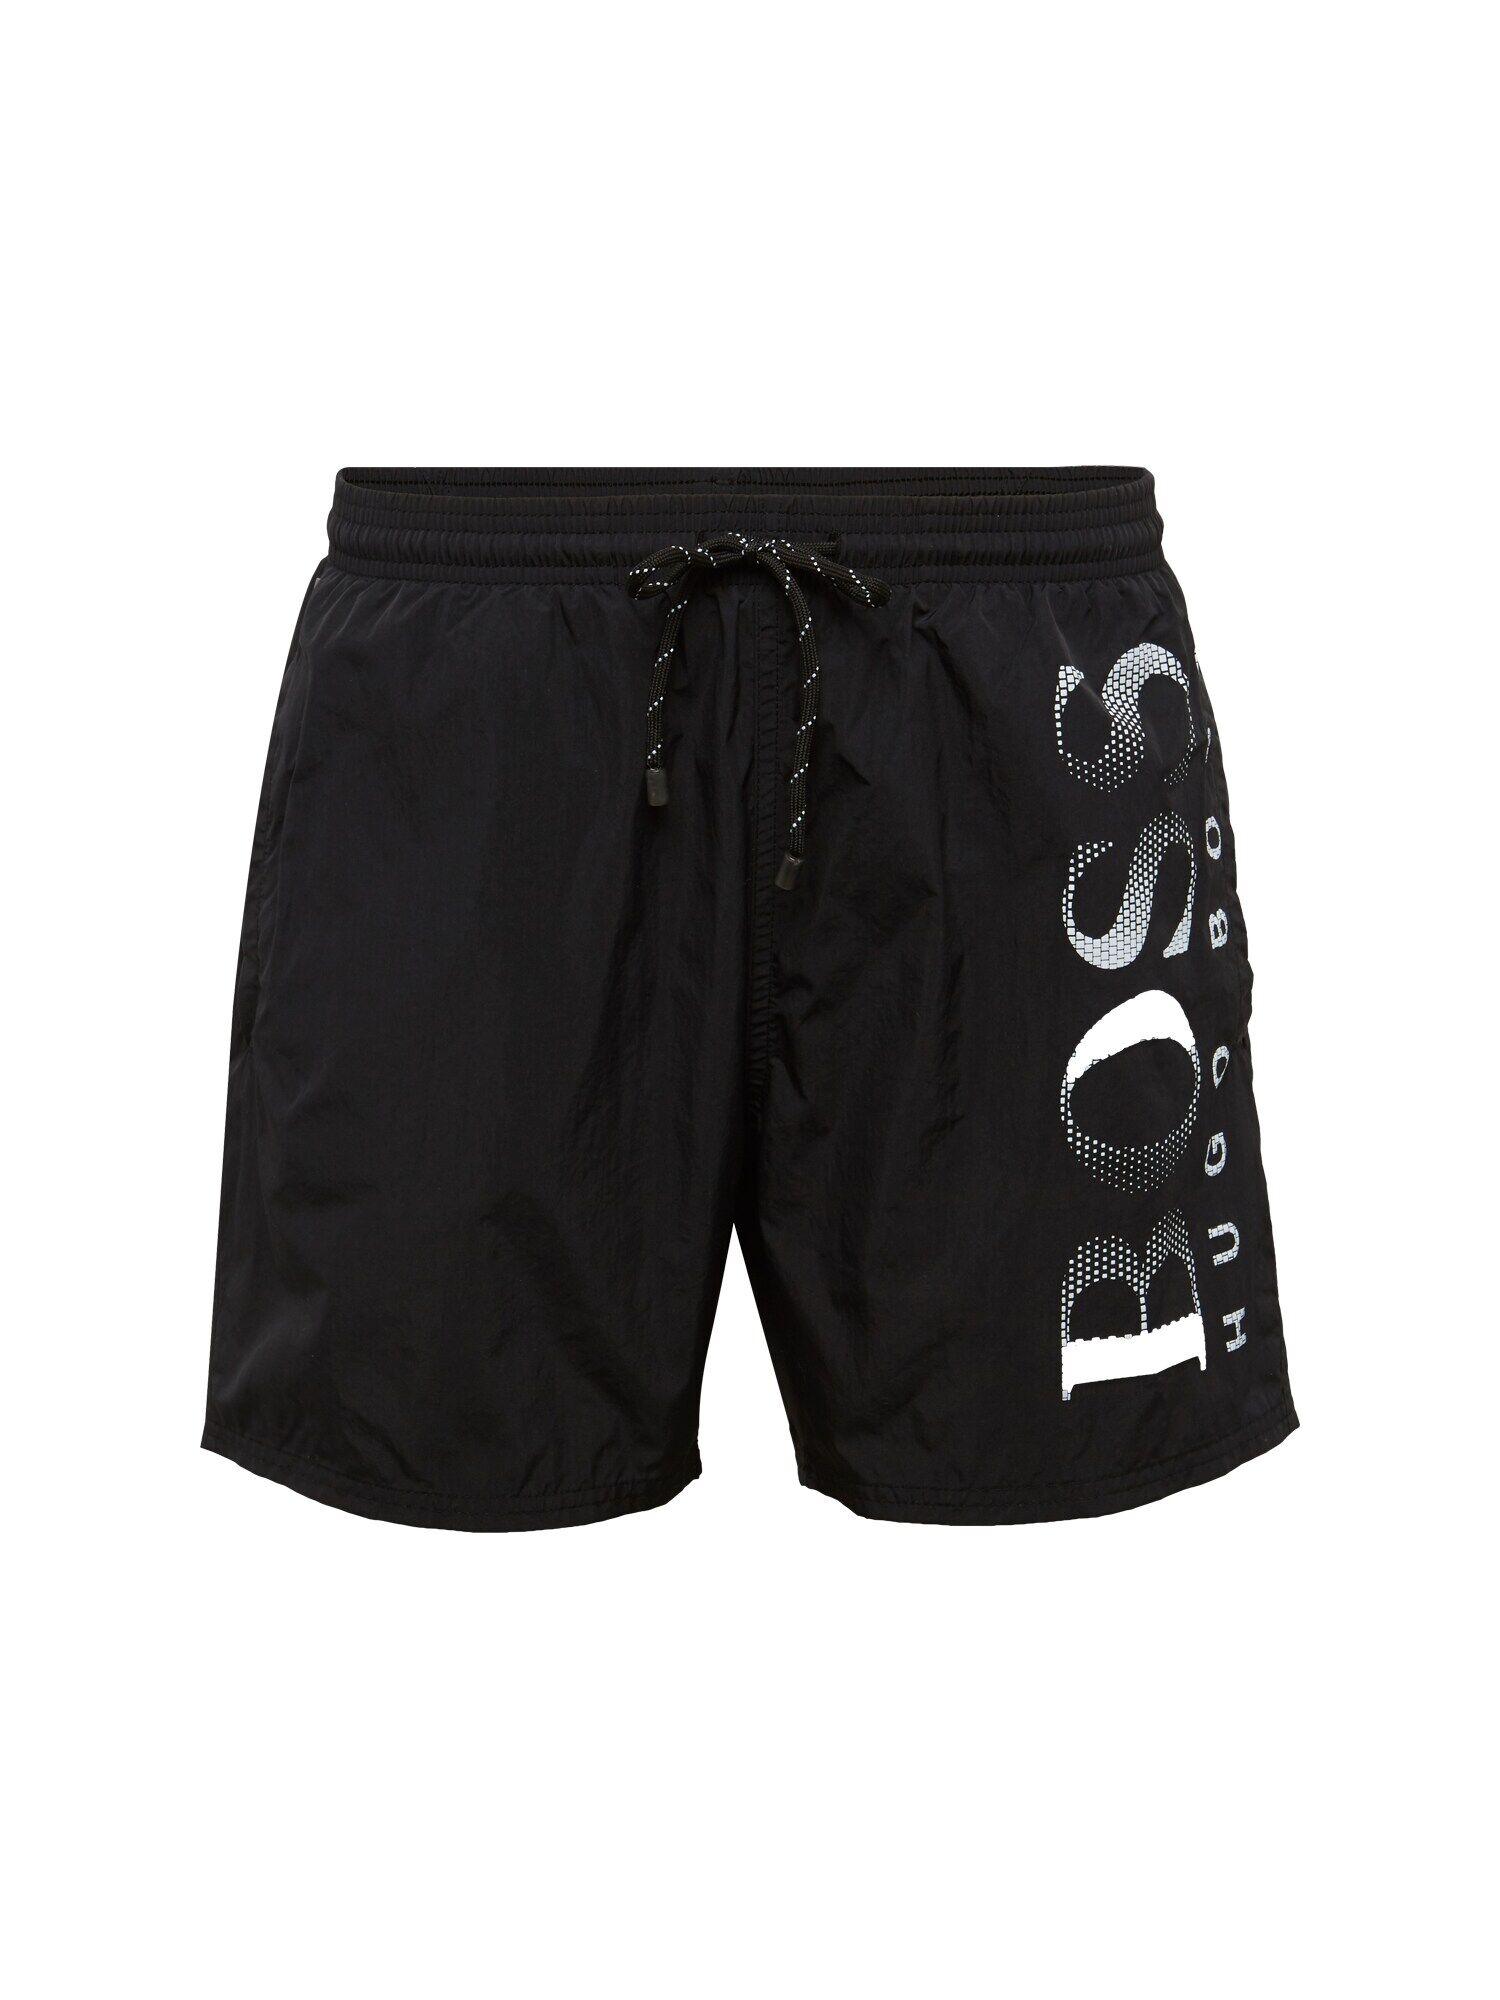 Boss Shorts de bain  - Noir - Taille: M - male